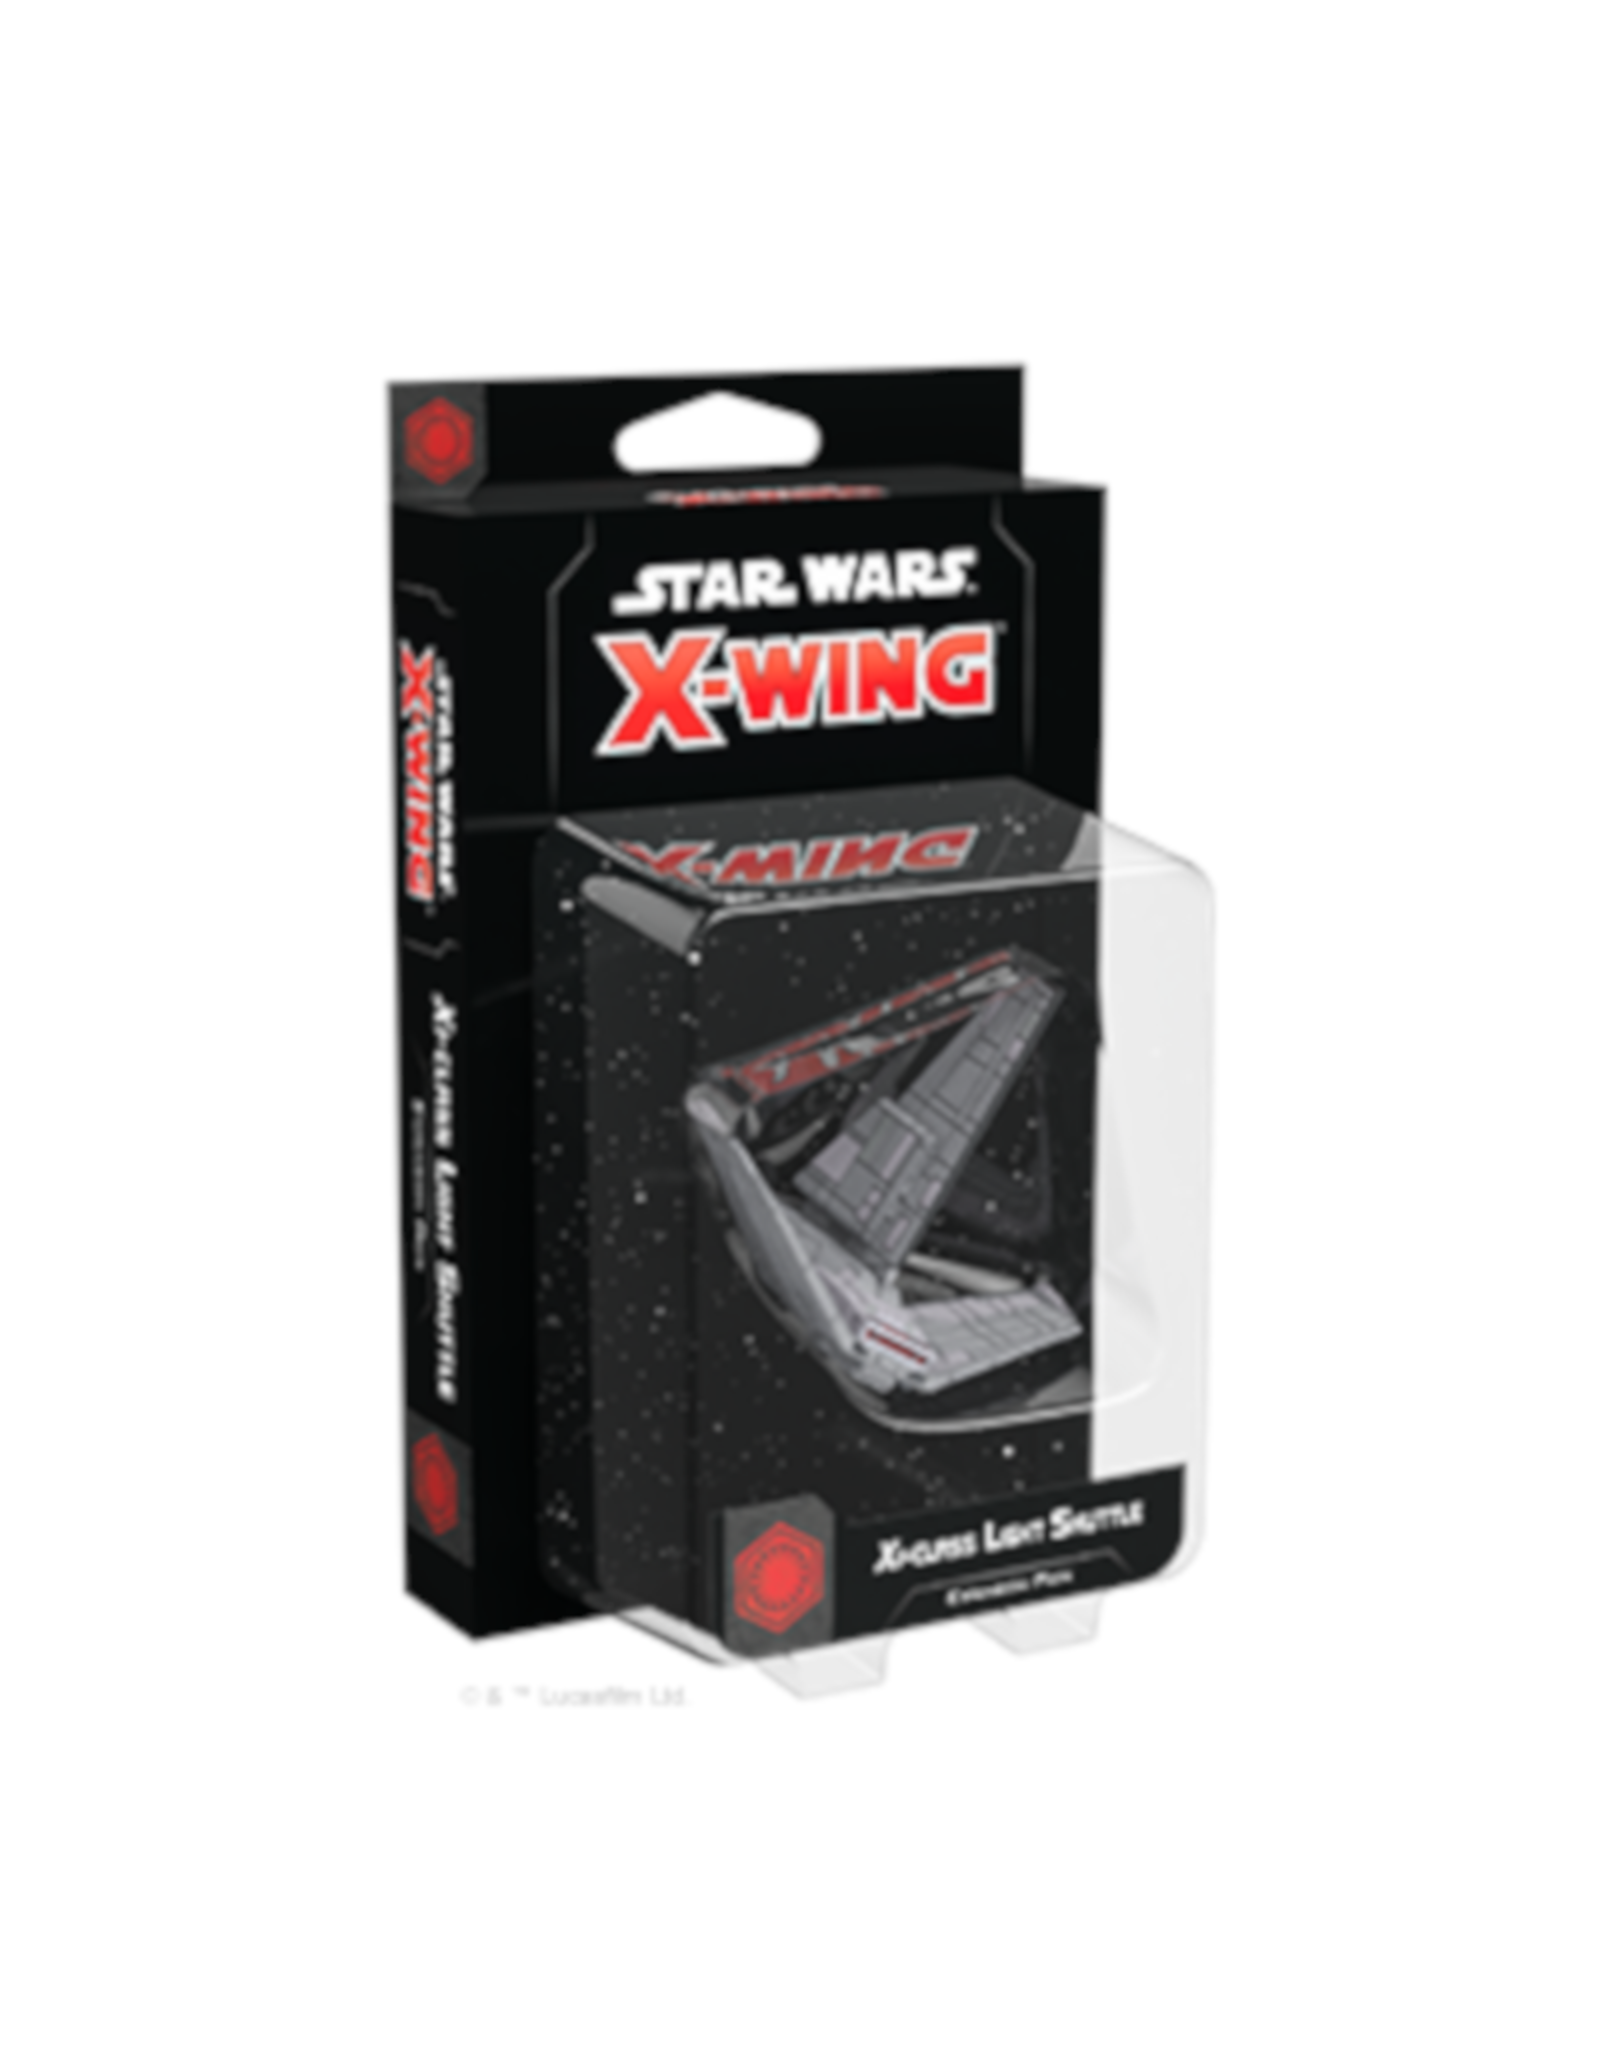 Fantasy Flight Games Star Wars X-Wing Xi-class Light Shuttle Expansion